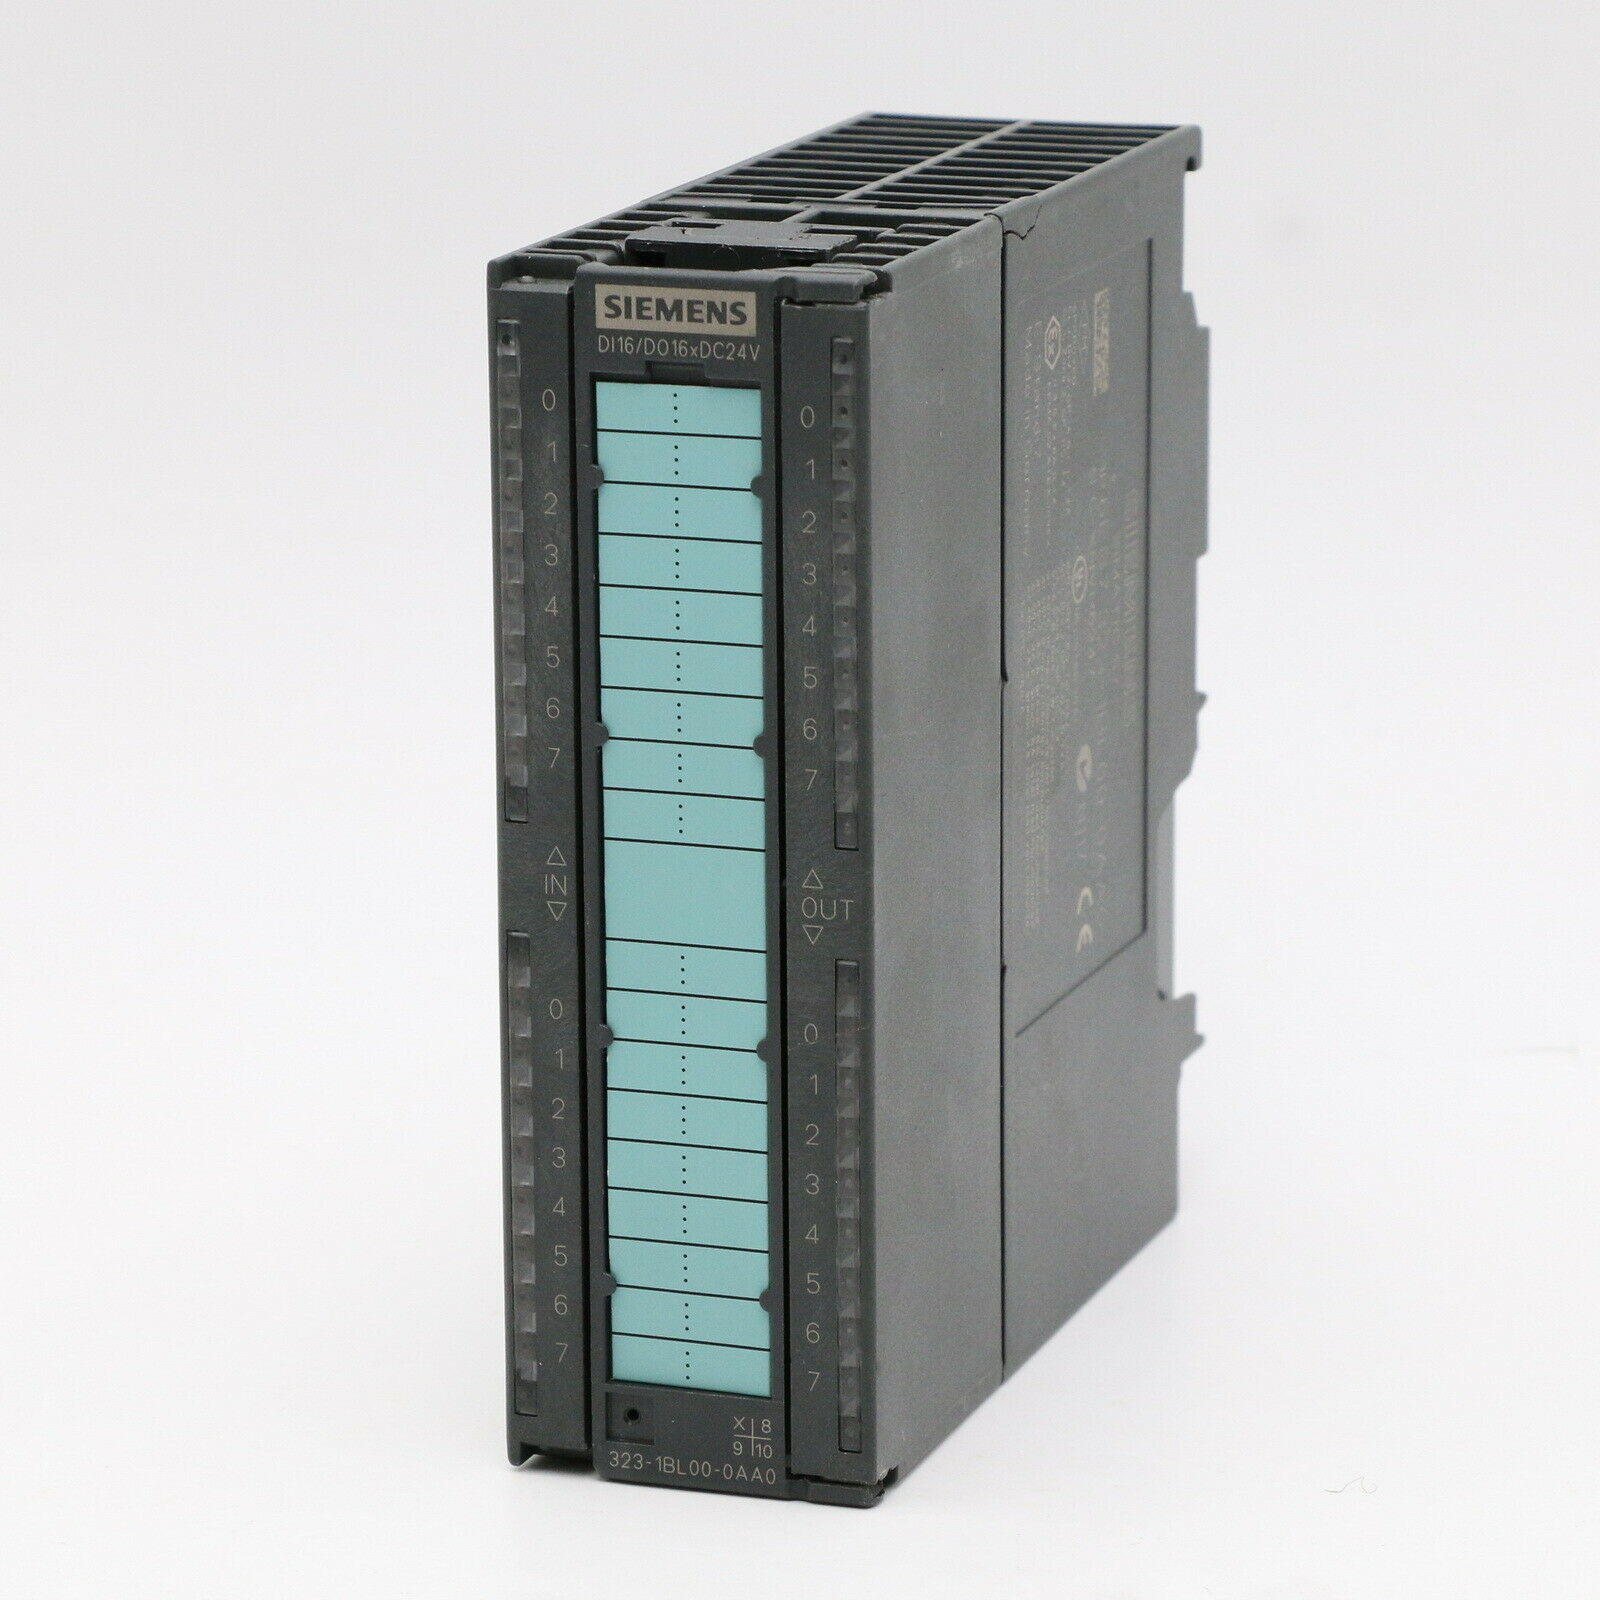 Siemens Simatic S7 SM323 6ES7323-1BL00-0AA0 DI16//DO16 6ES7-323-1BL00-0AA0